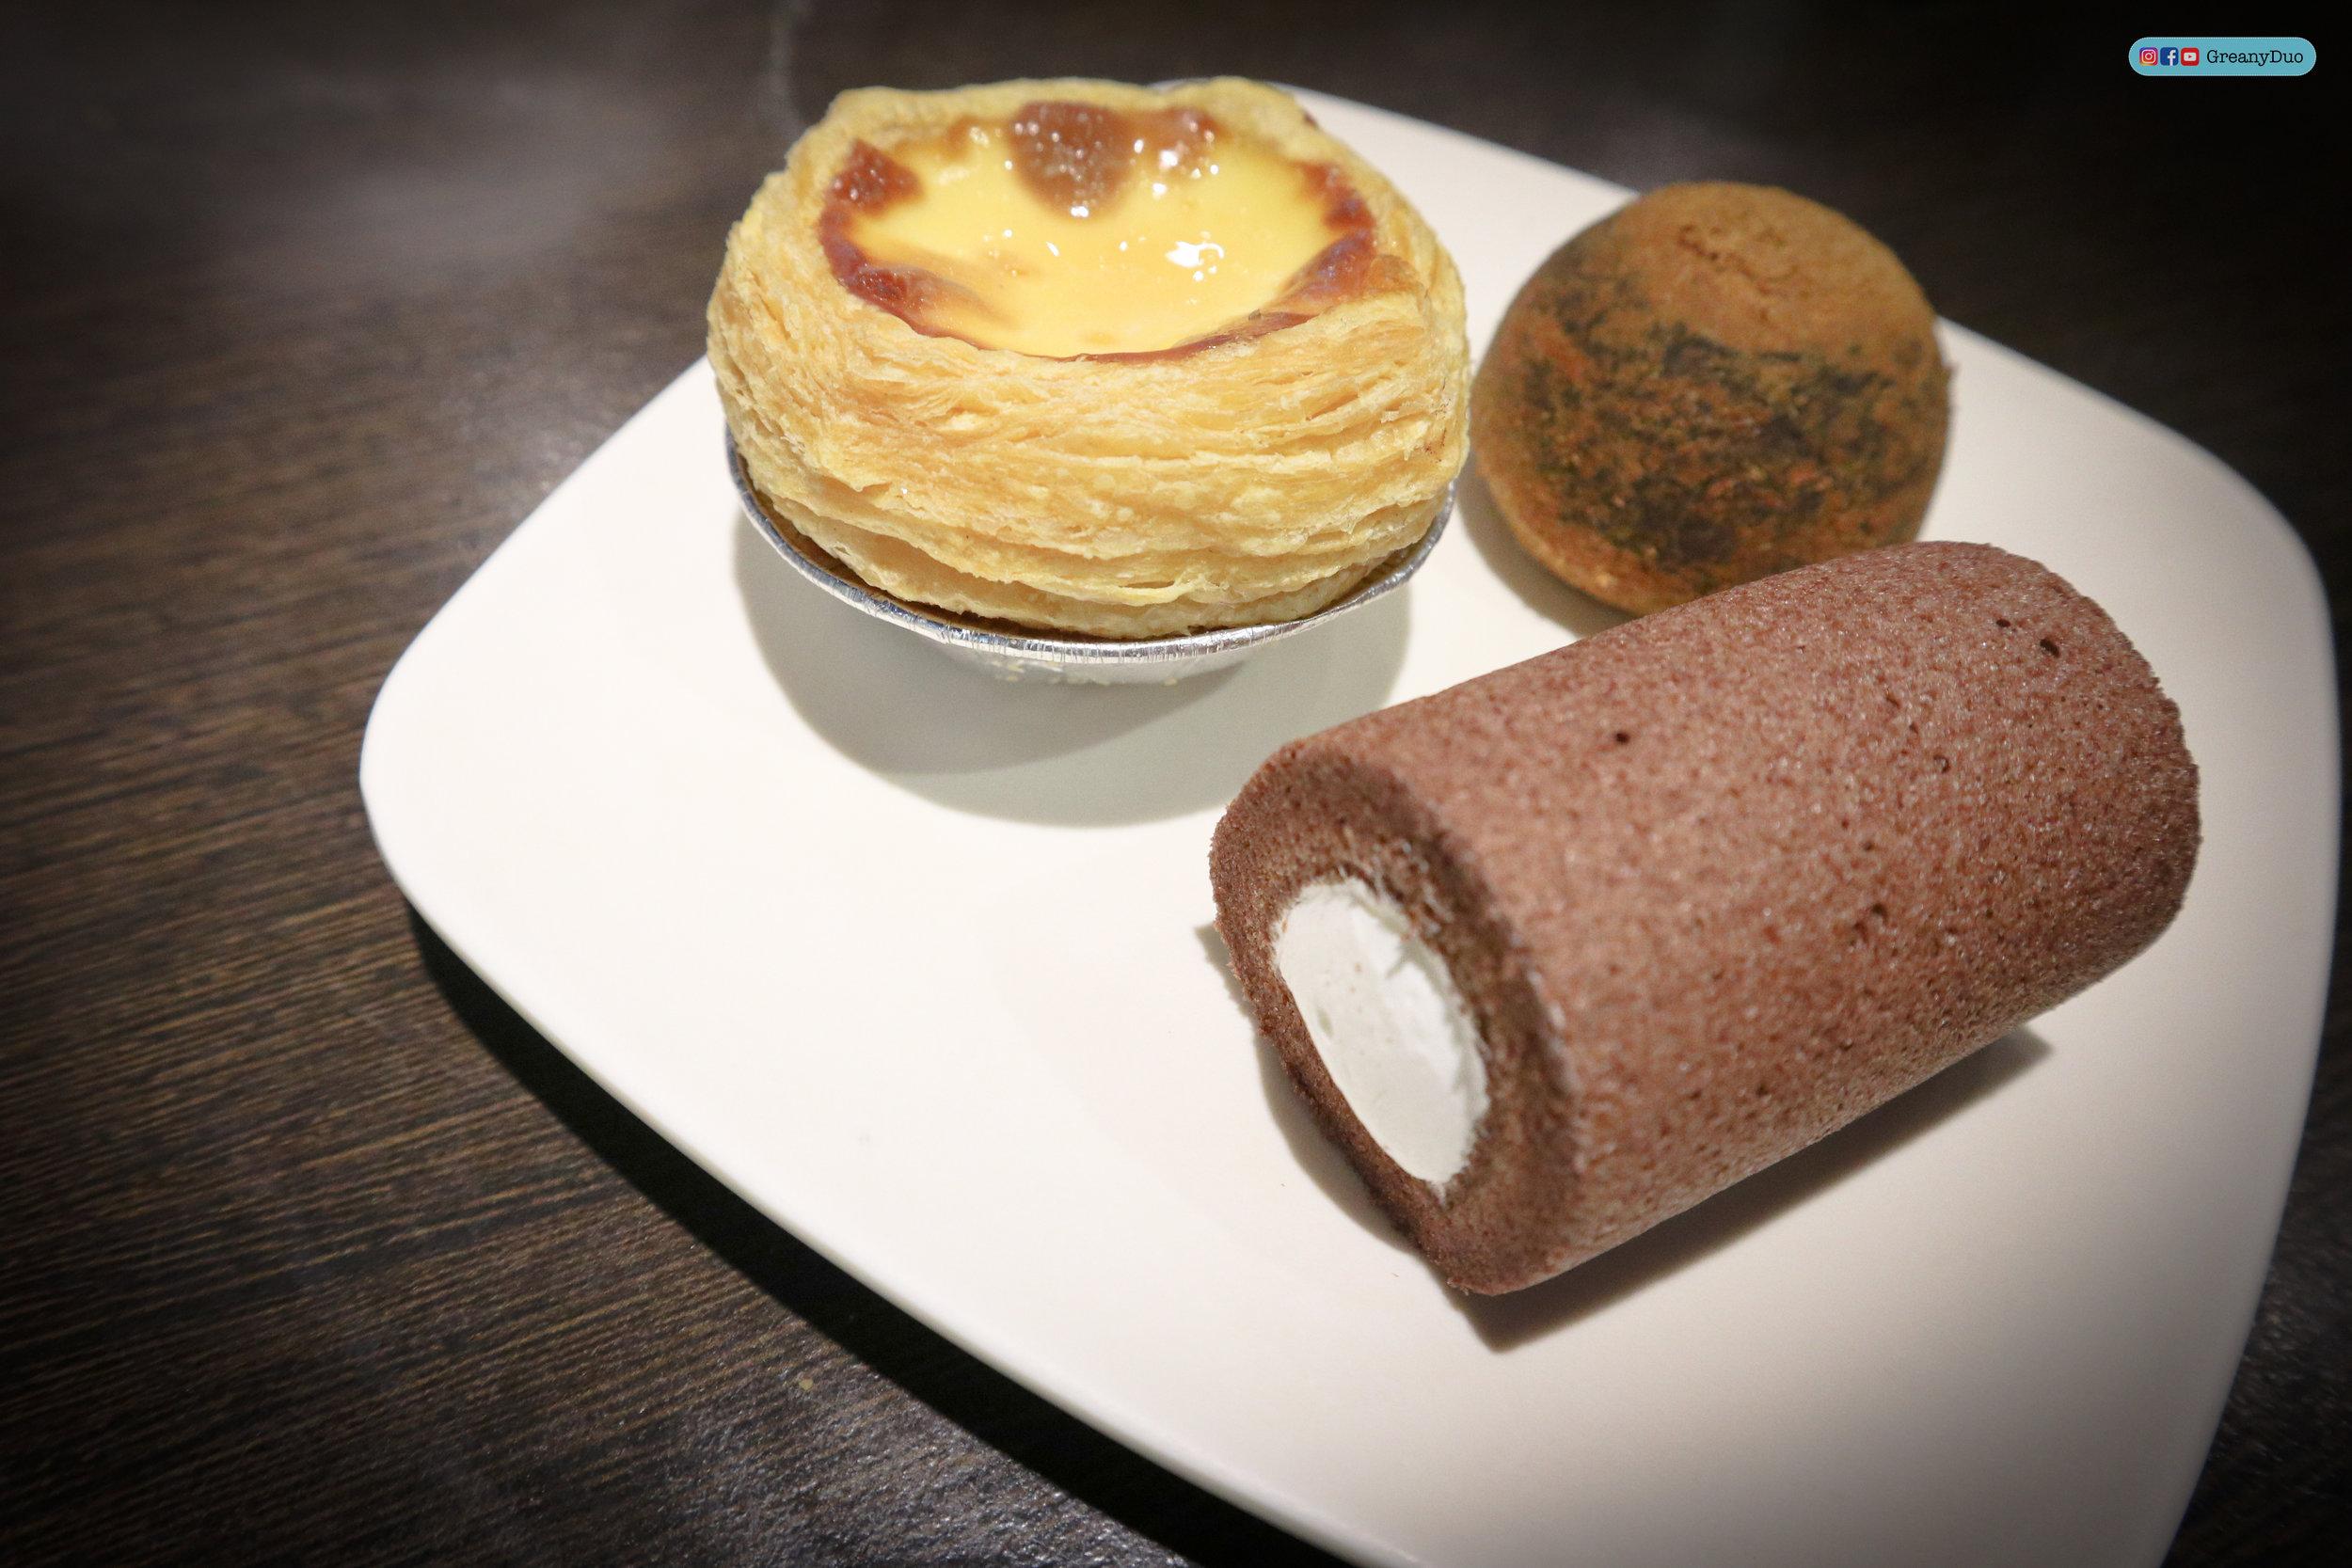 desserts at บุฟเฟ่ต์ชาบูไต้หวันที่ Hakkai Shabu Shabu ซีเหมินติง